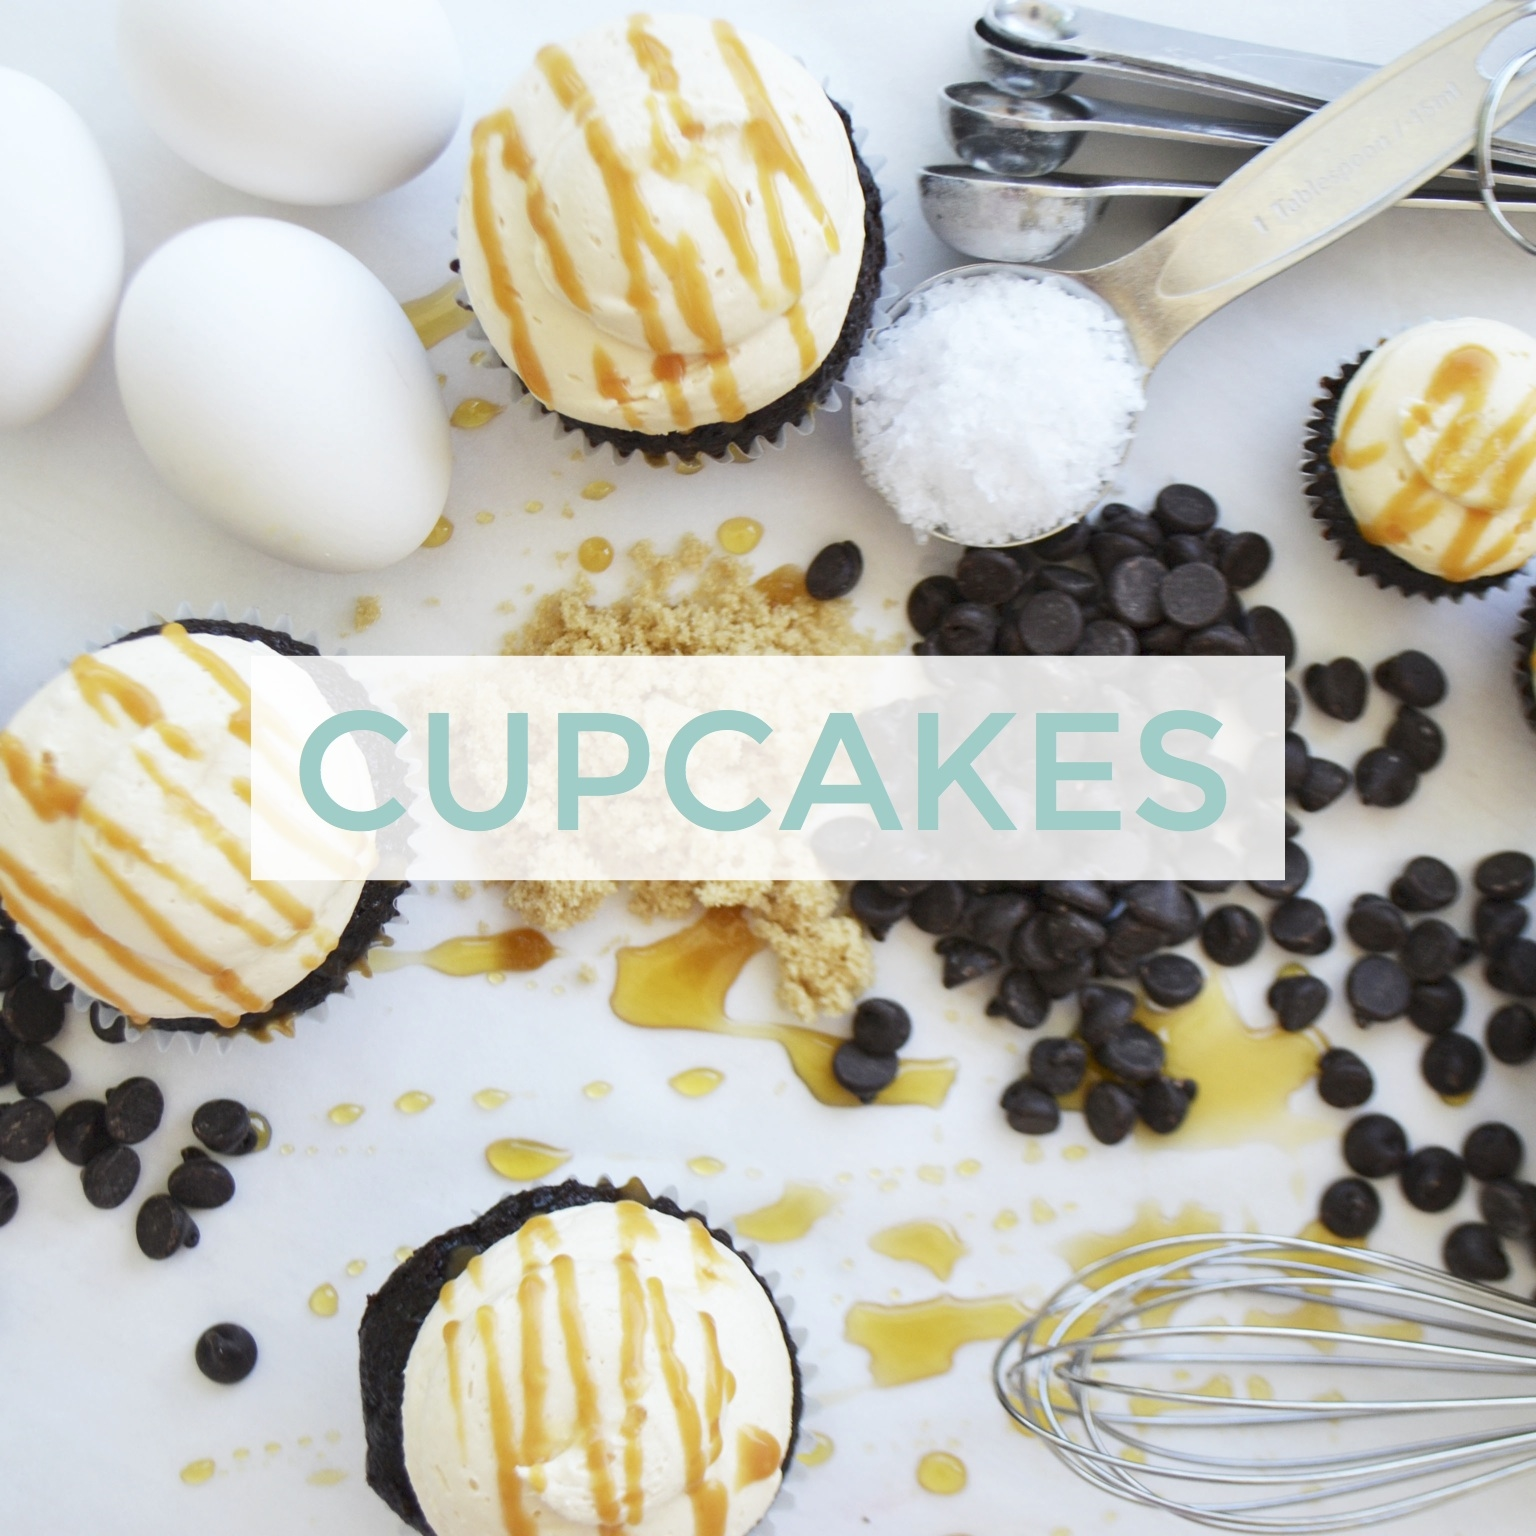 Best Cupcakes in Toronto